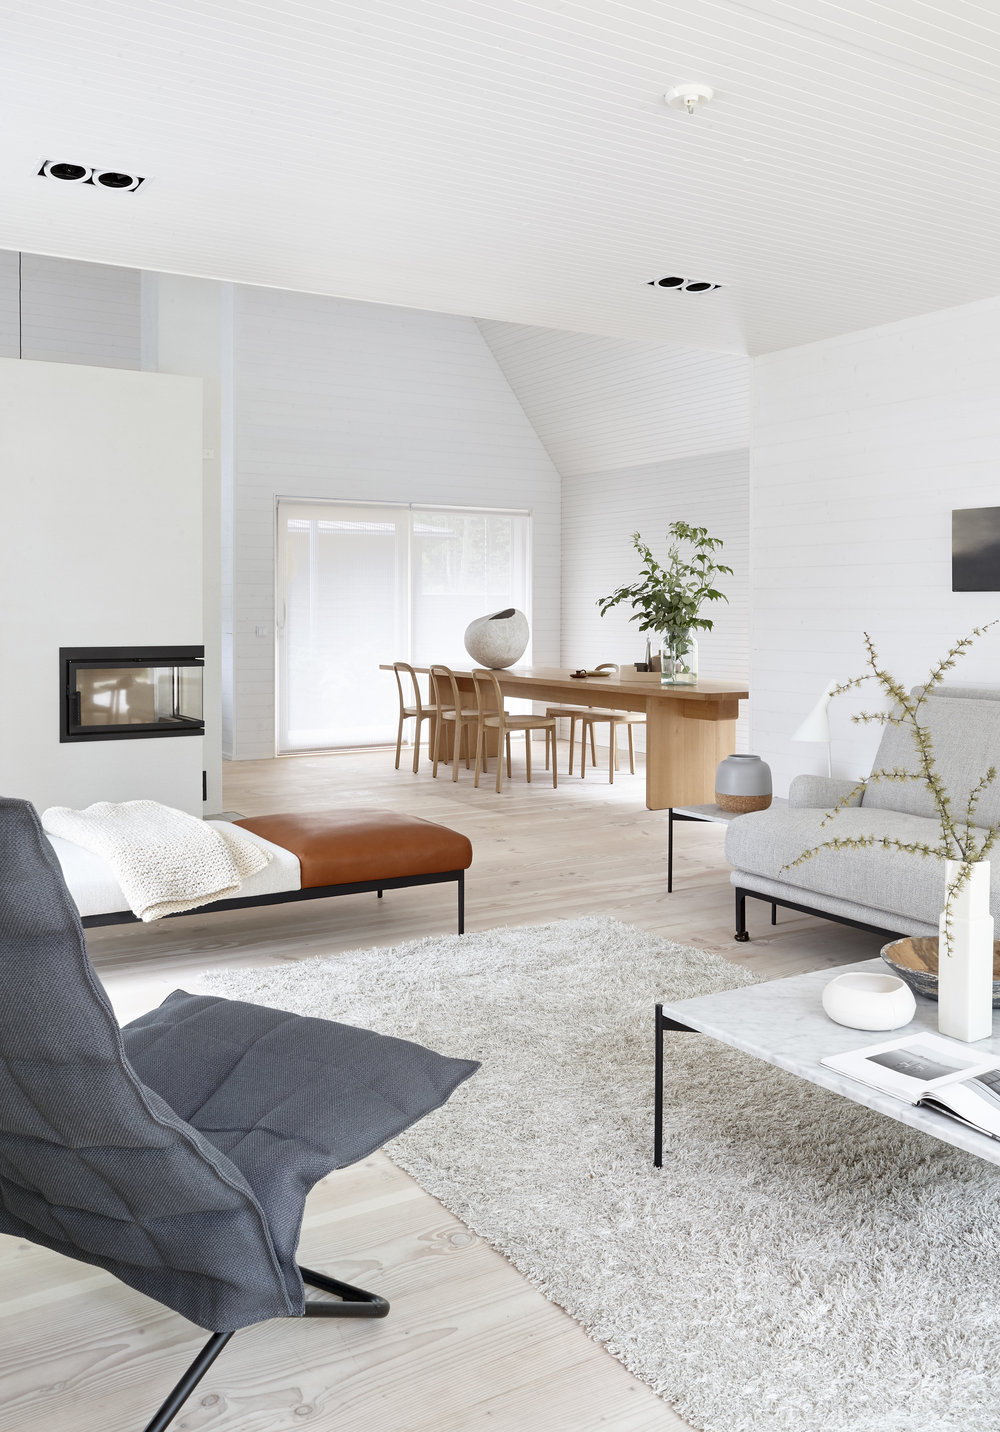 1640115 WILD Light Grey tufted linen wool carpet